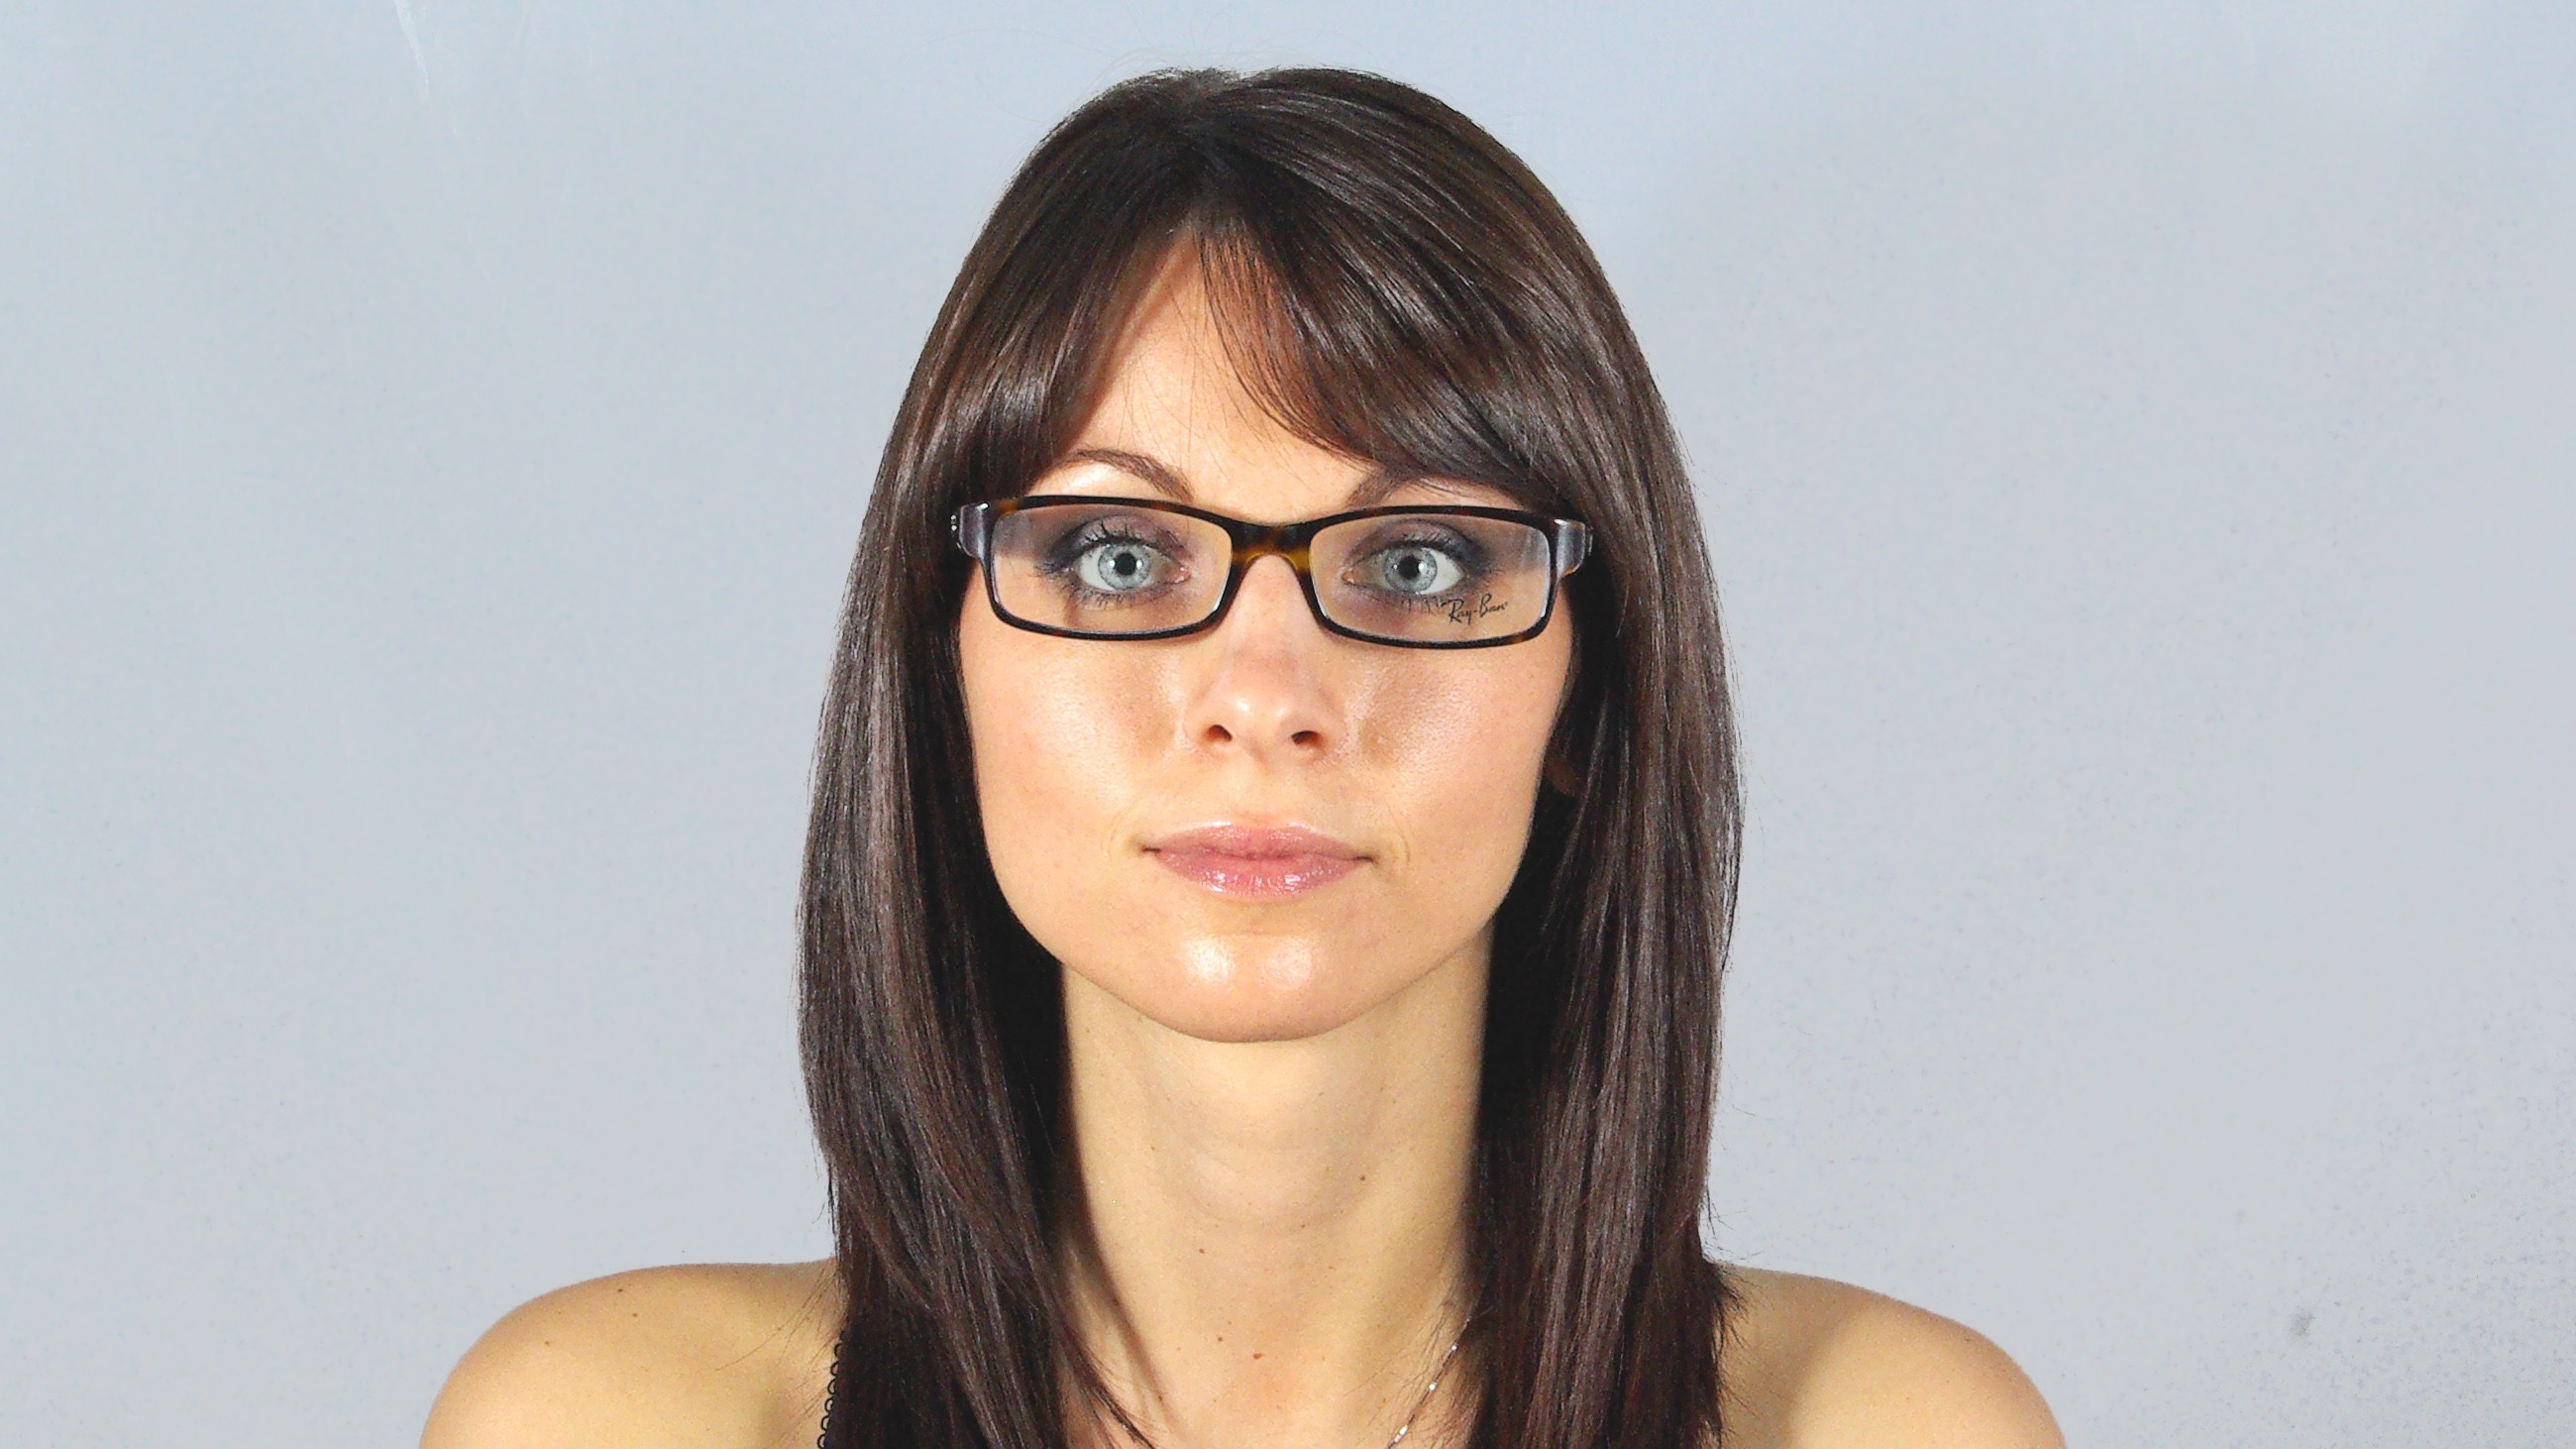 Ray Ban 5150 Eyeglasses